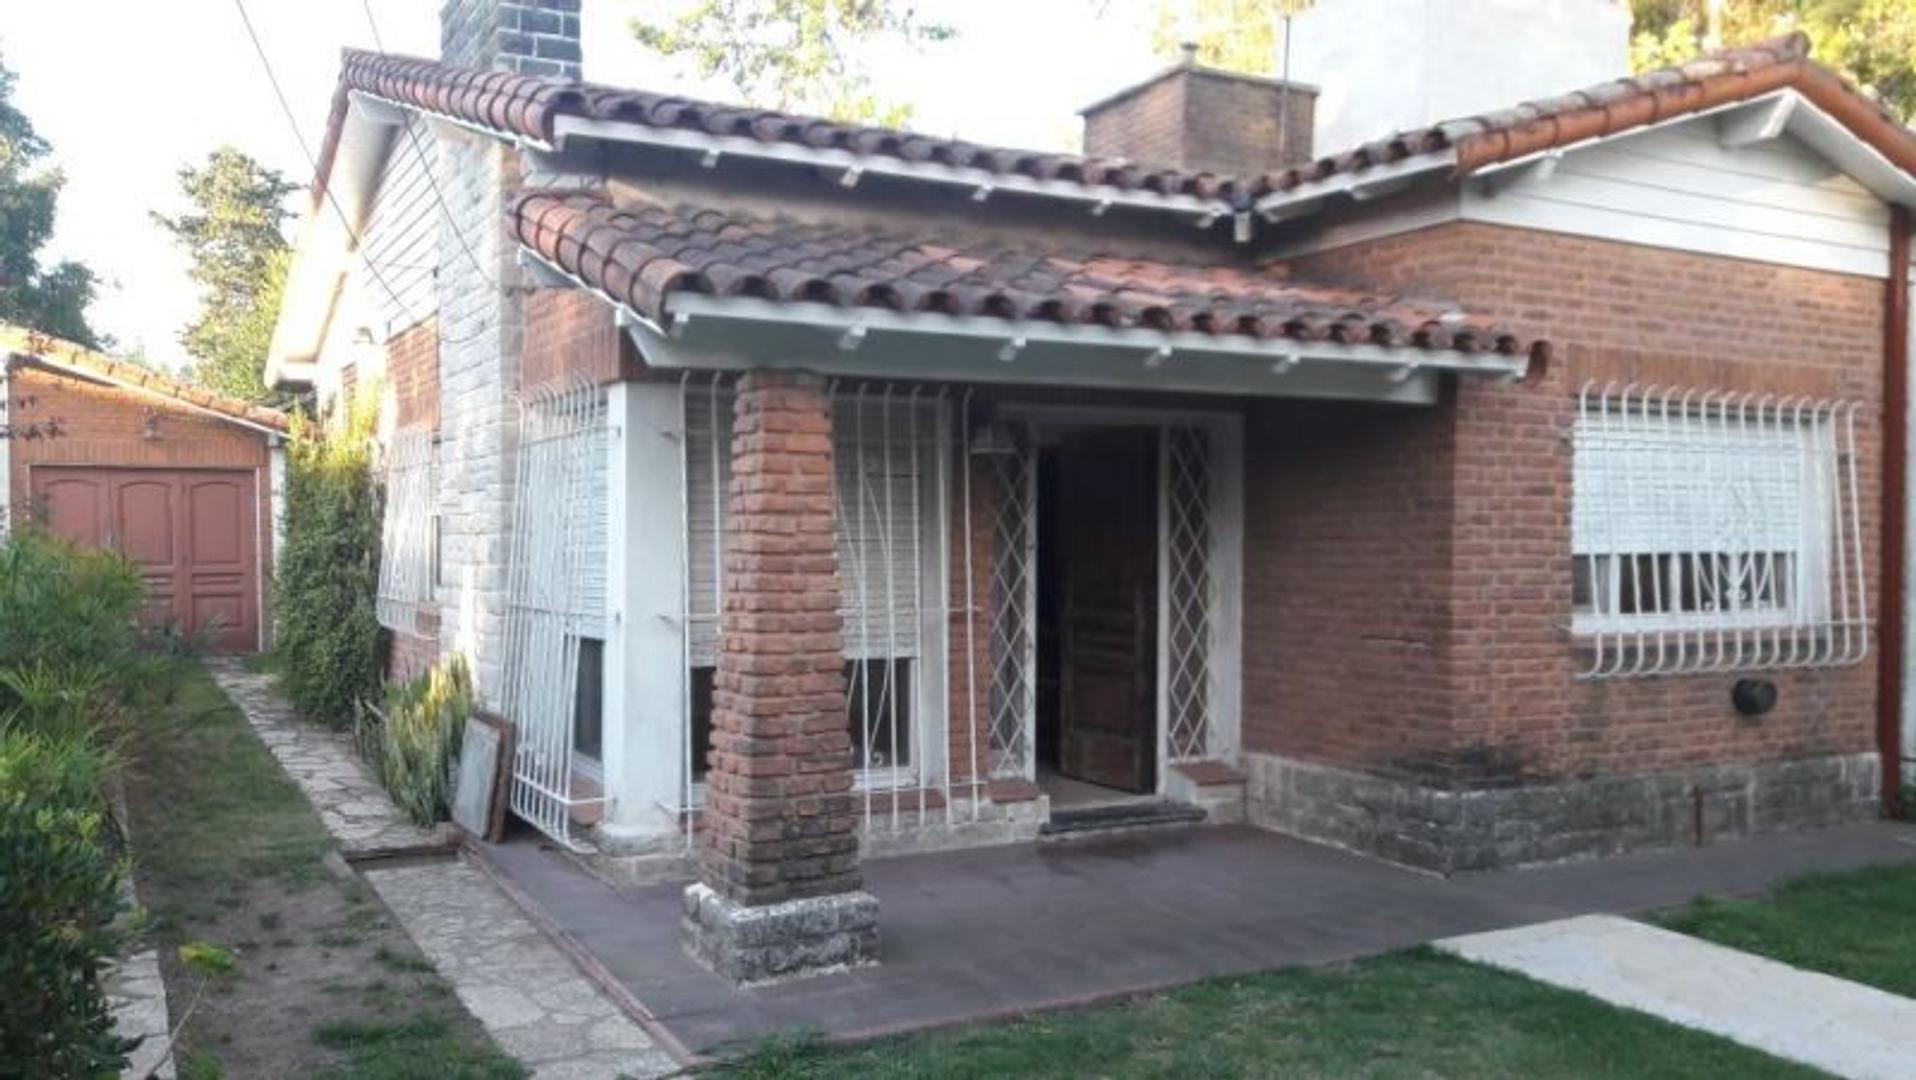 XINTEL(INB-INB-2101) Casa - Venta - Argentina, Berazategui - CALLE 365 1120